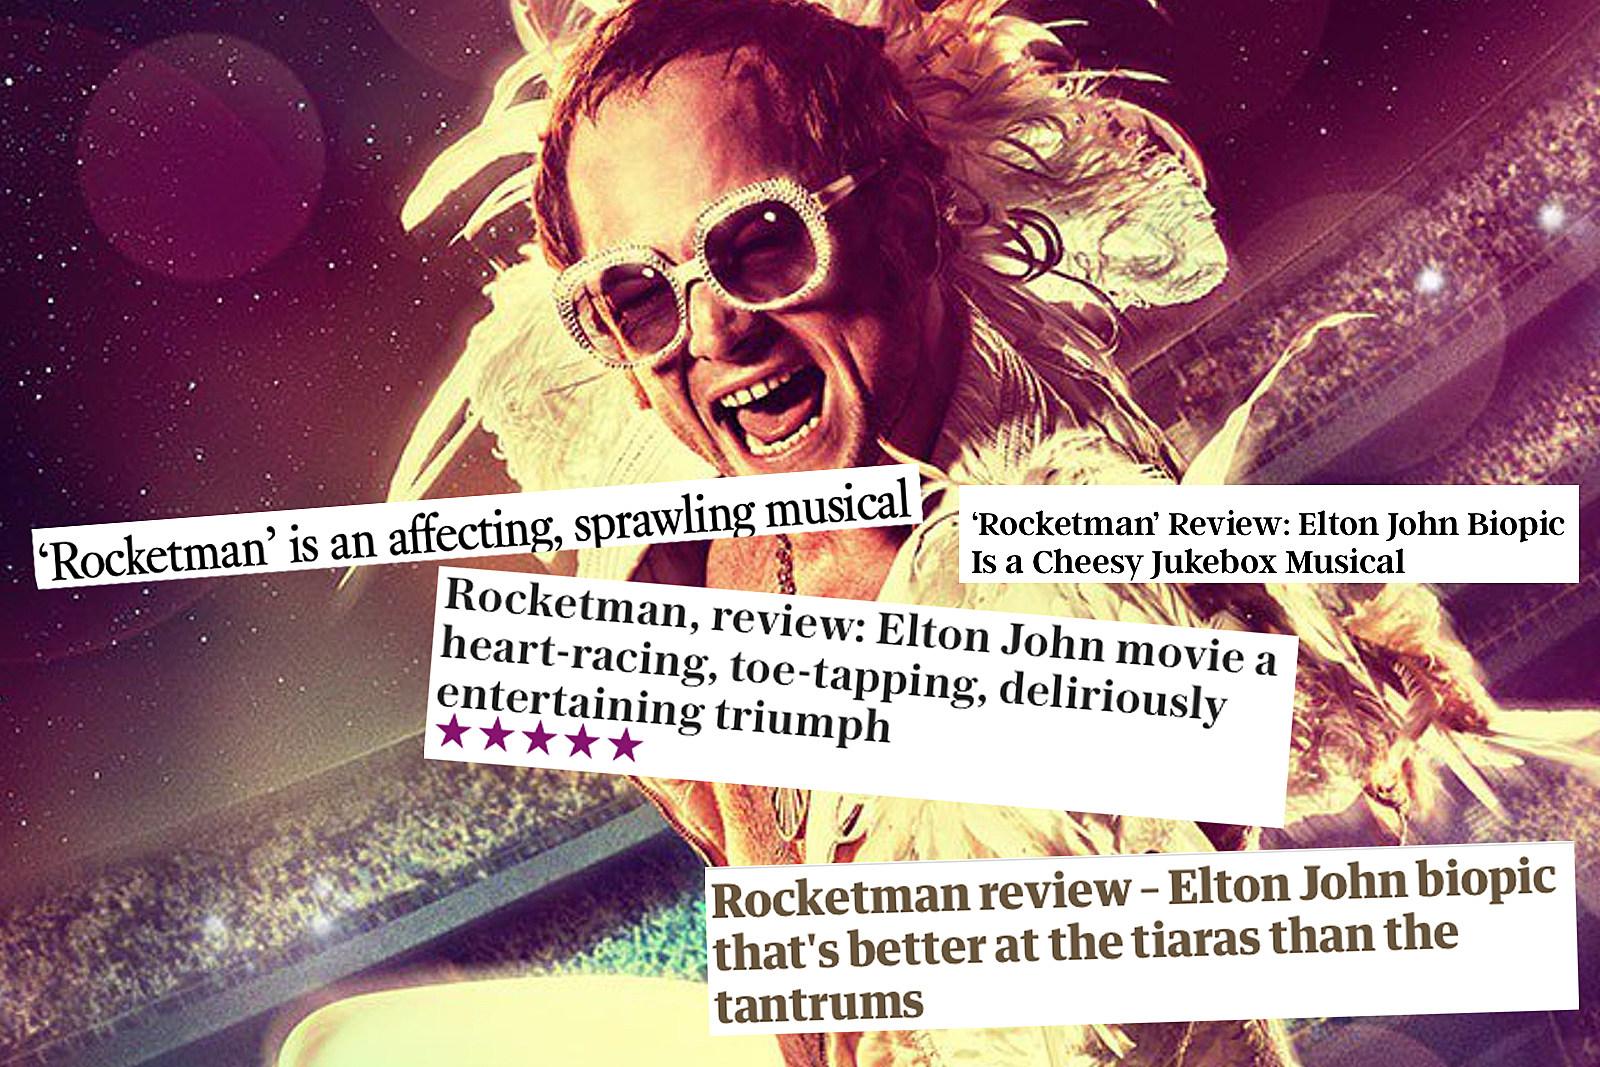 Elton John Adds His Own Rave Review for 'Rocketman'